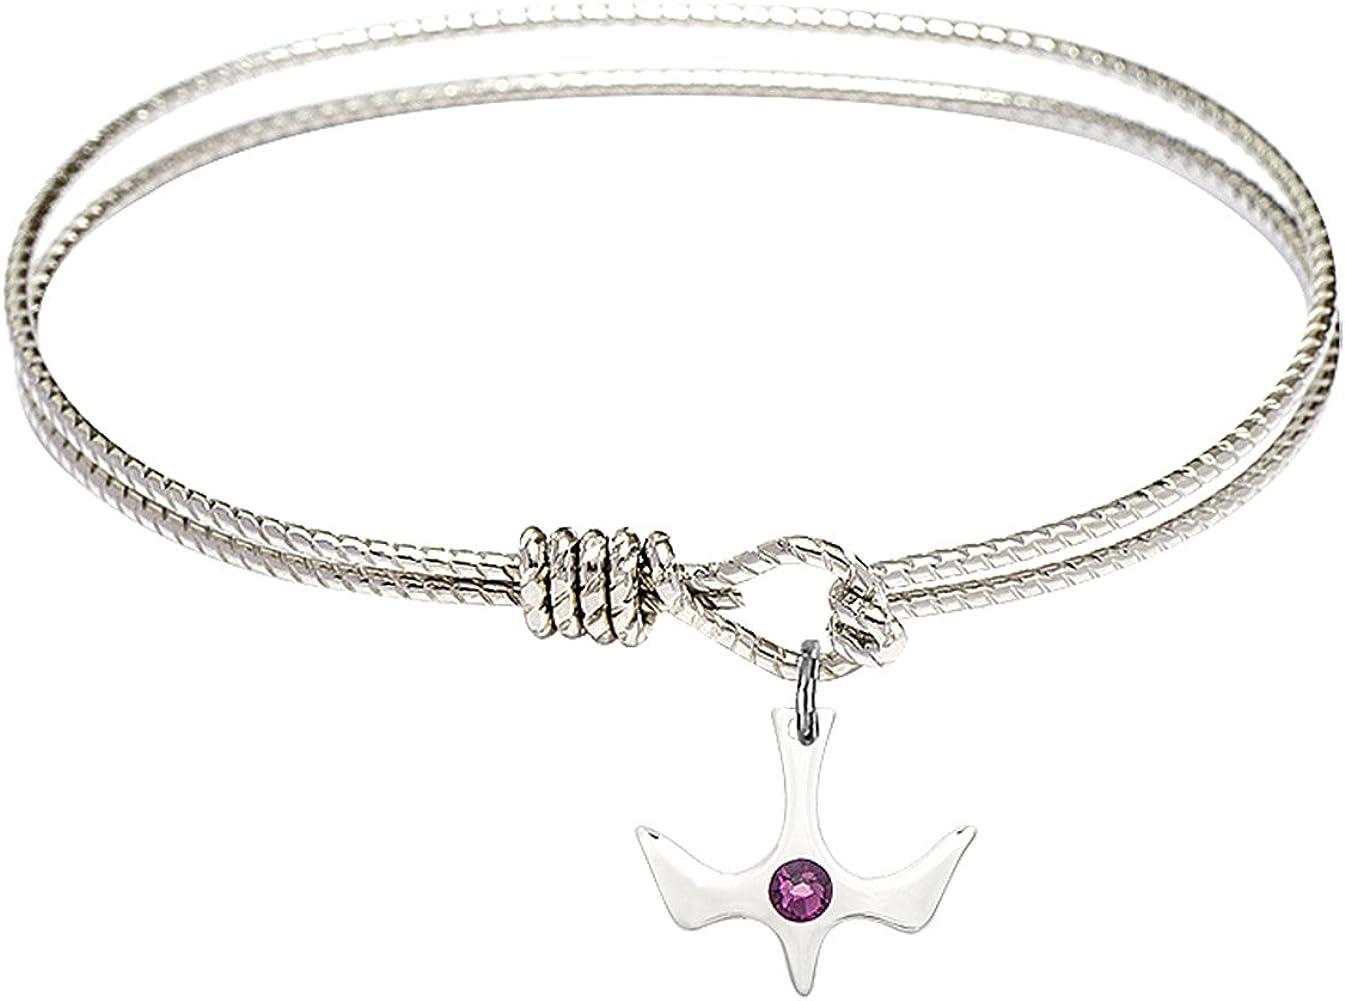 6 1 4 inch Oval Eye Hook ch w Bangle Spirit medal Holy Popular overseas Sale Bracelet